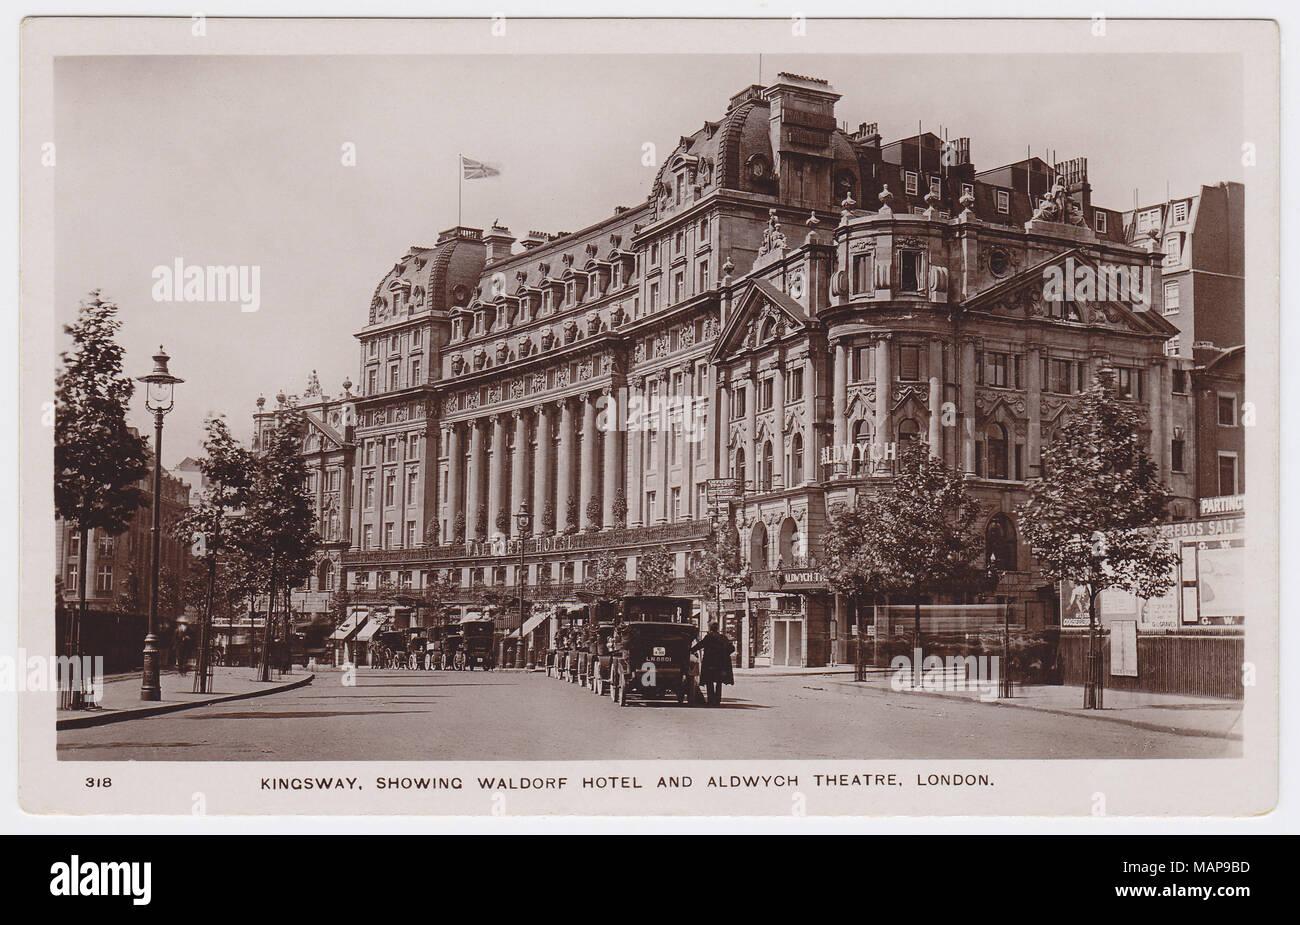 The Waldorf Hotel & Aldwych, London, United Kingdom - Stock Image